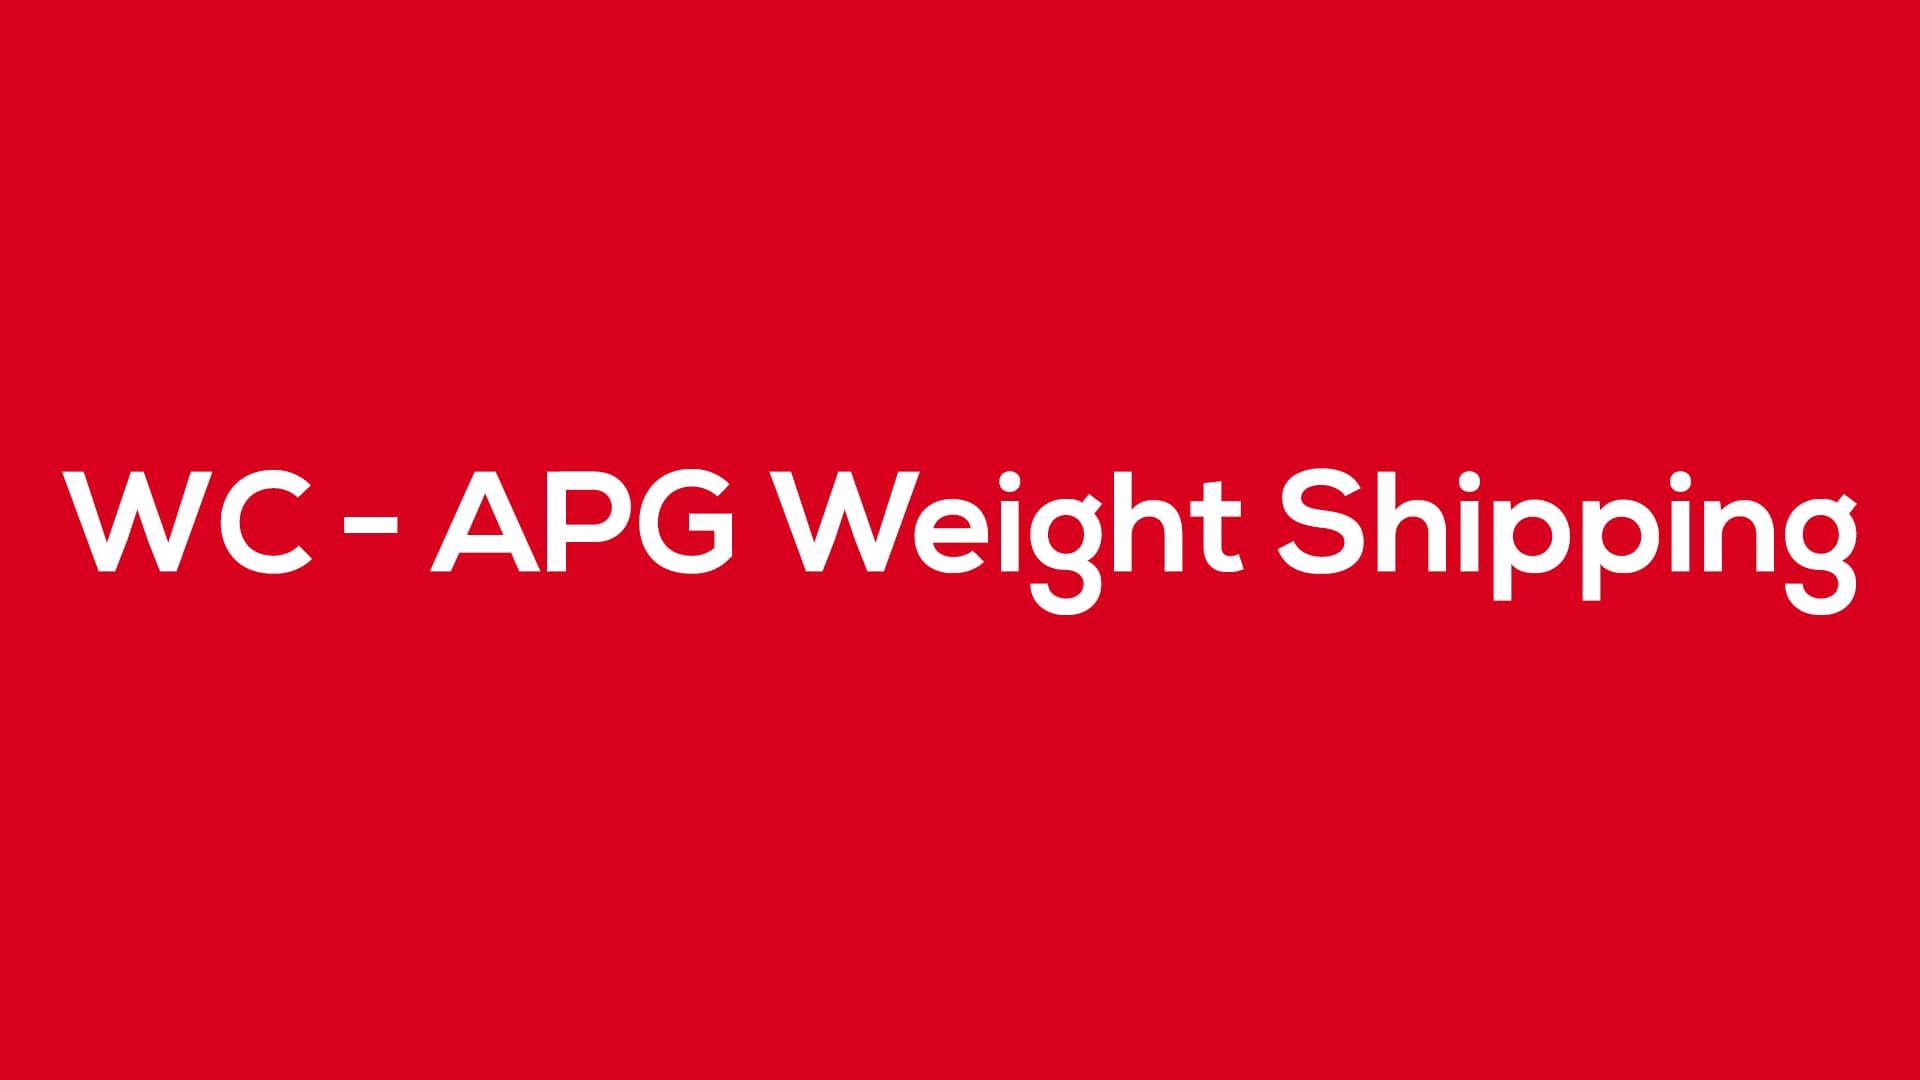 WC - APG Weight Shipping - Blog